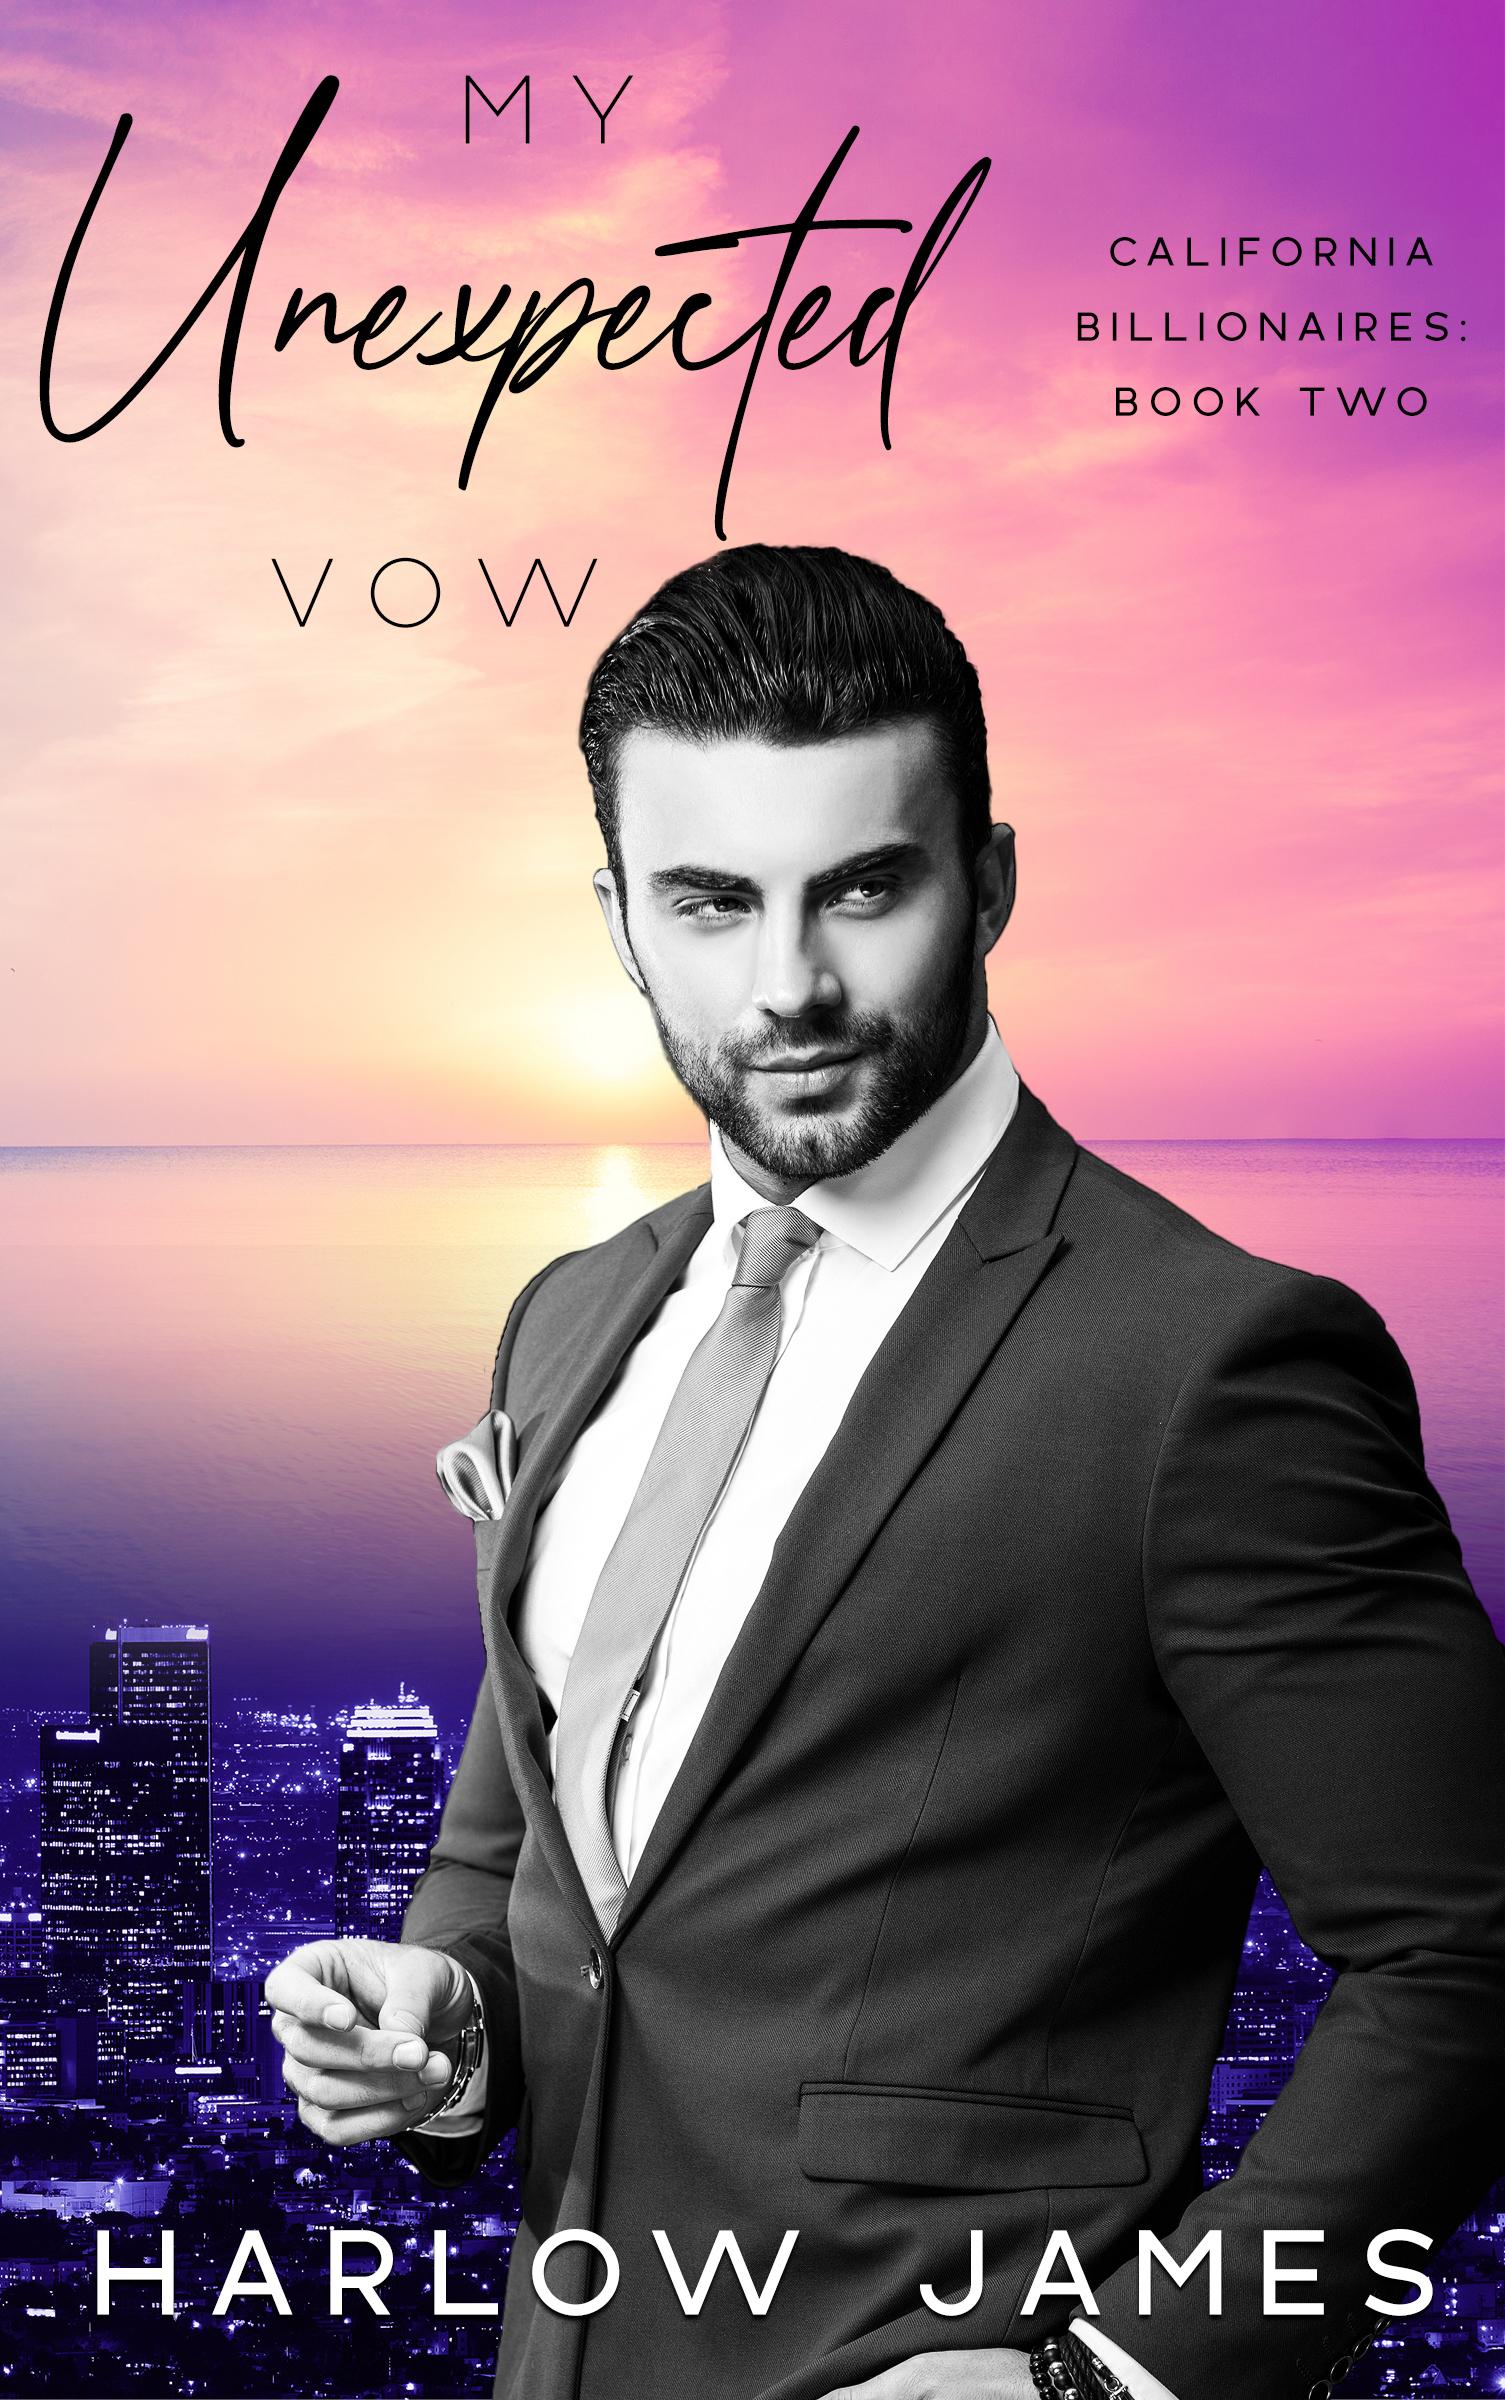 My Unexpected Vow (California Billionaires #2)